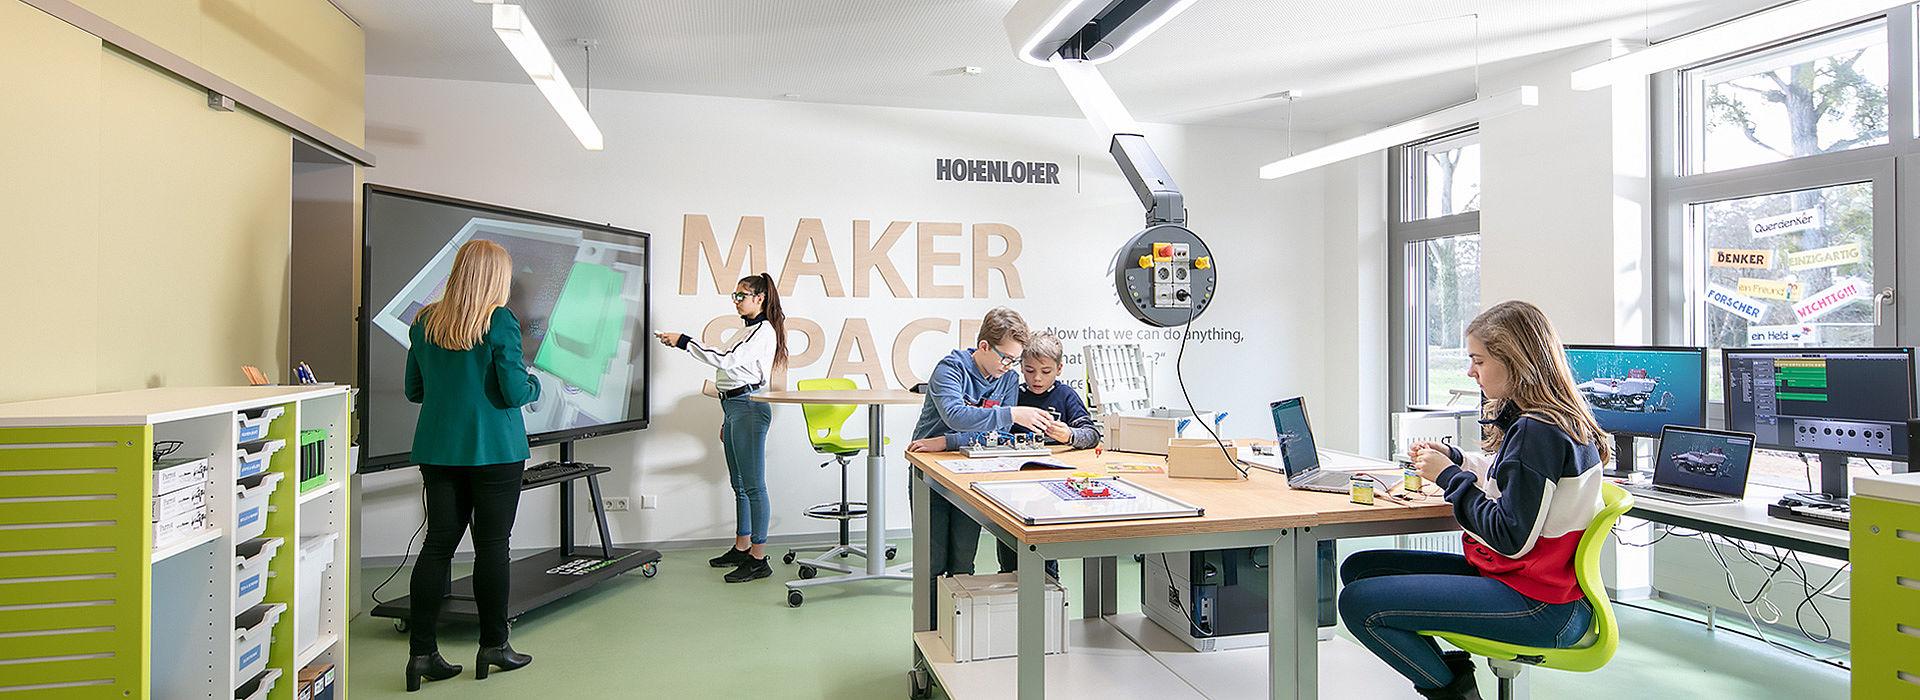 Bild: Co-kreatives Lernen im Makerspace